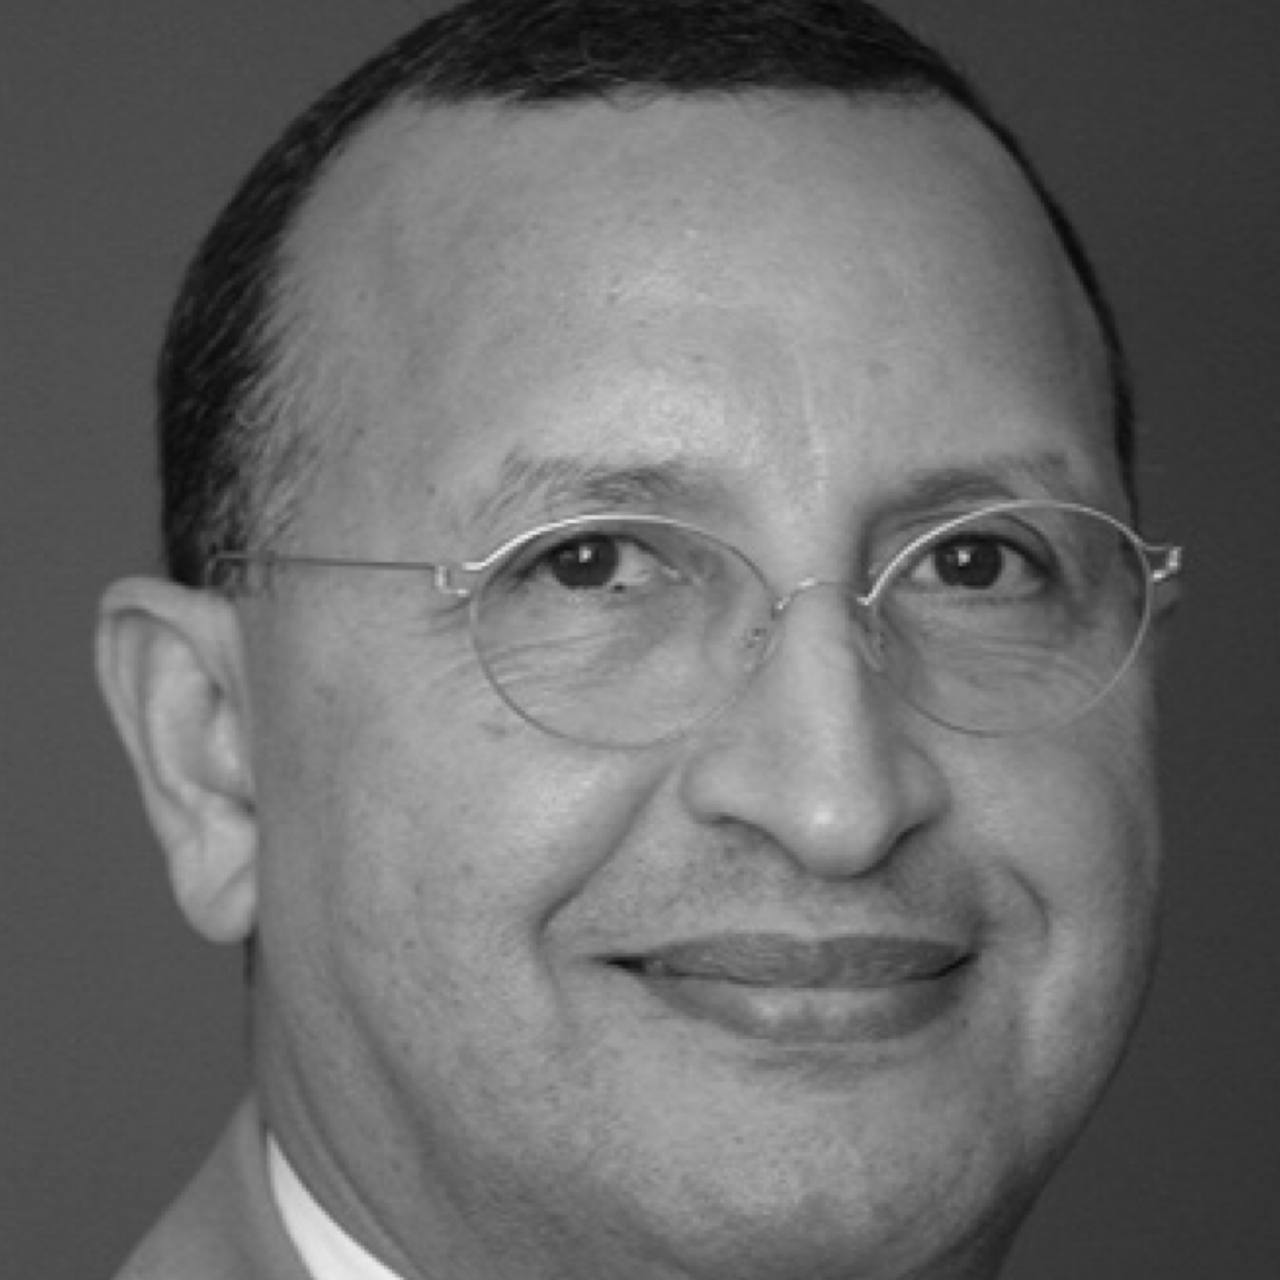 Latif Ladid